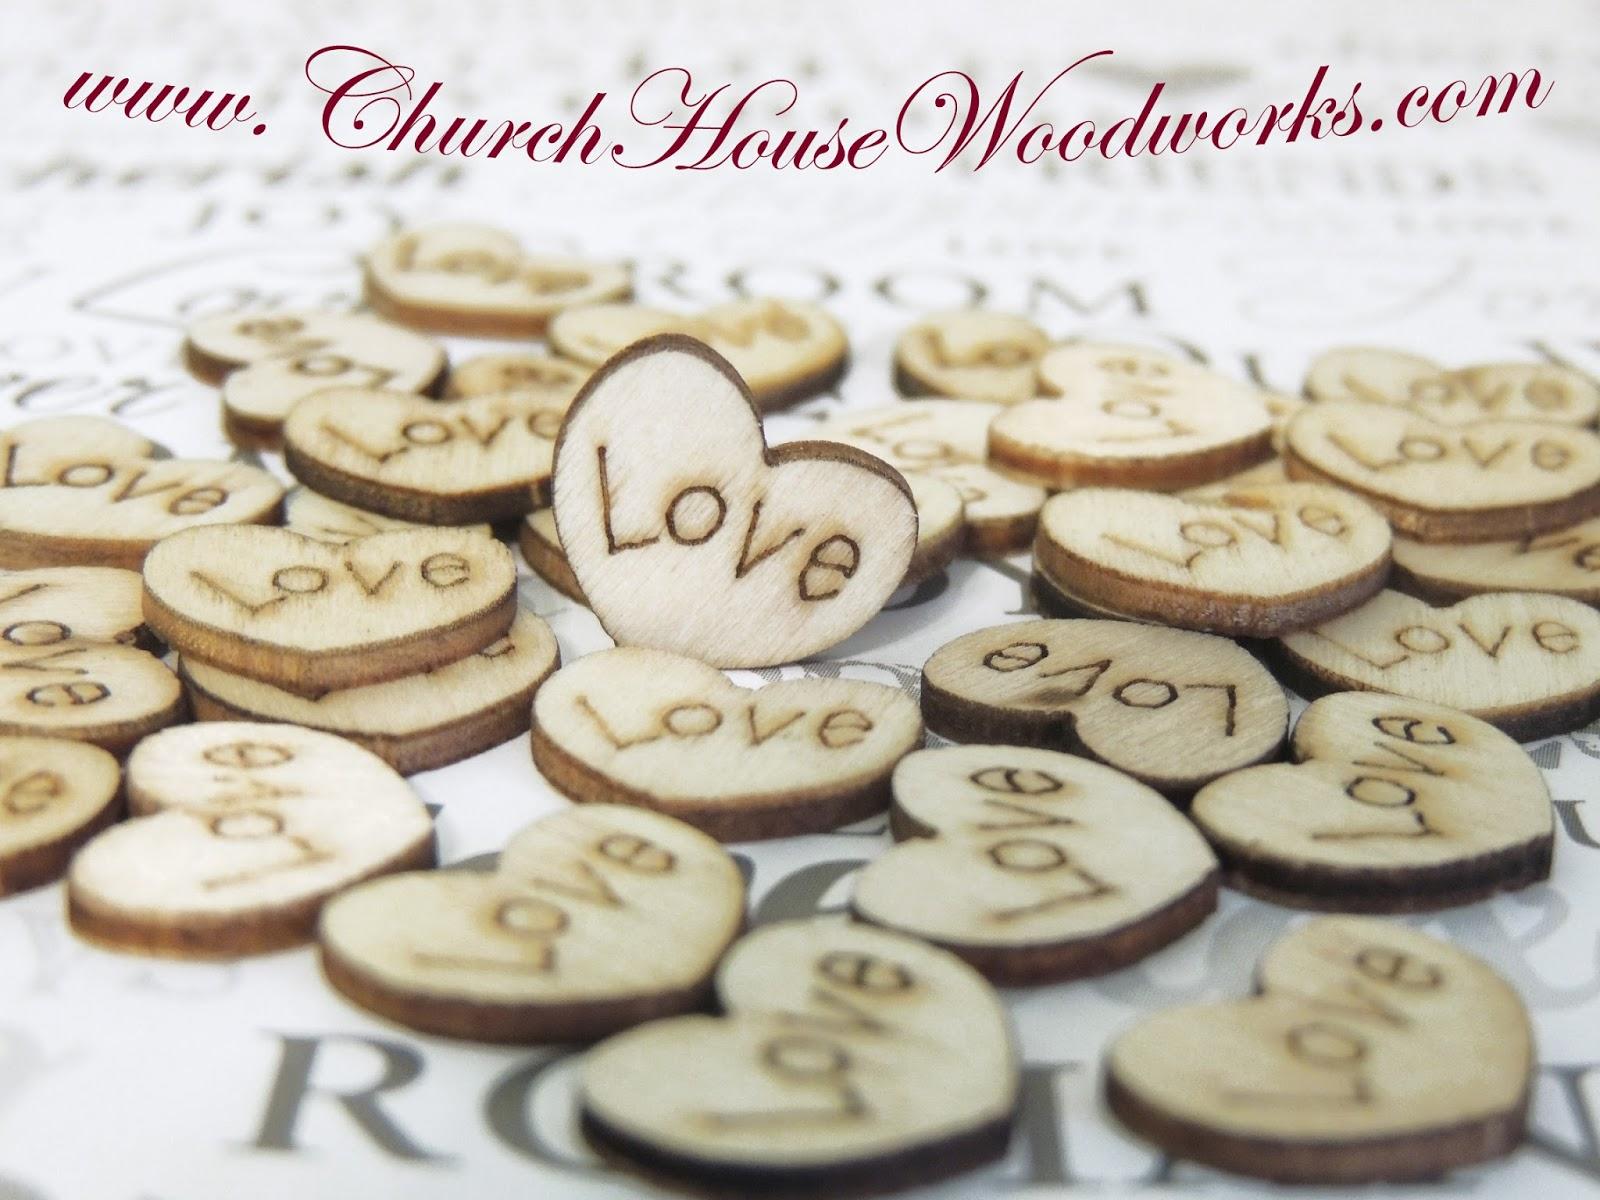 Rustic 4 Weddings: February 2016